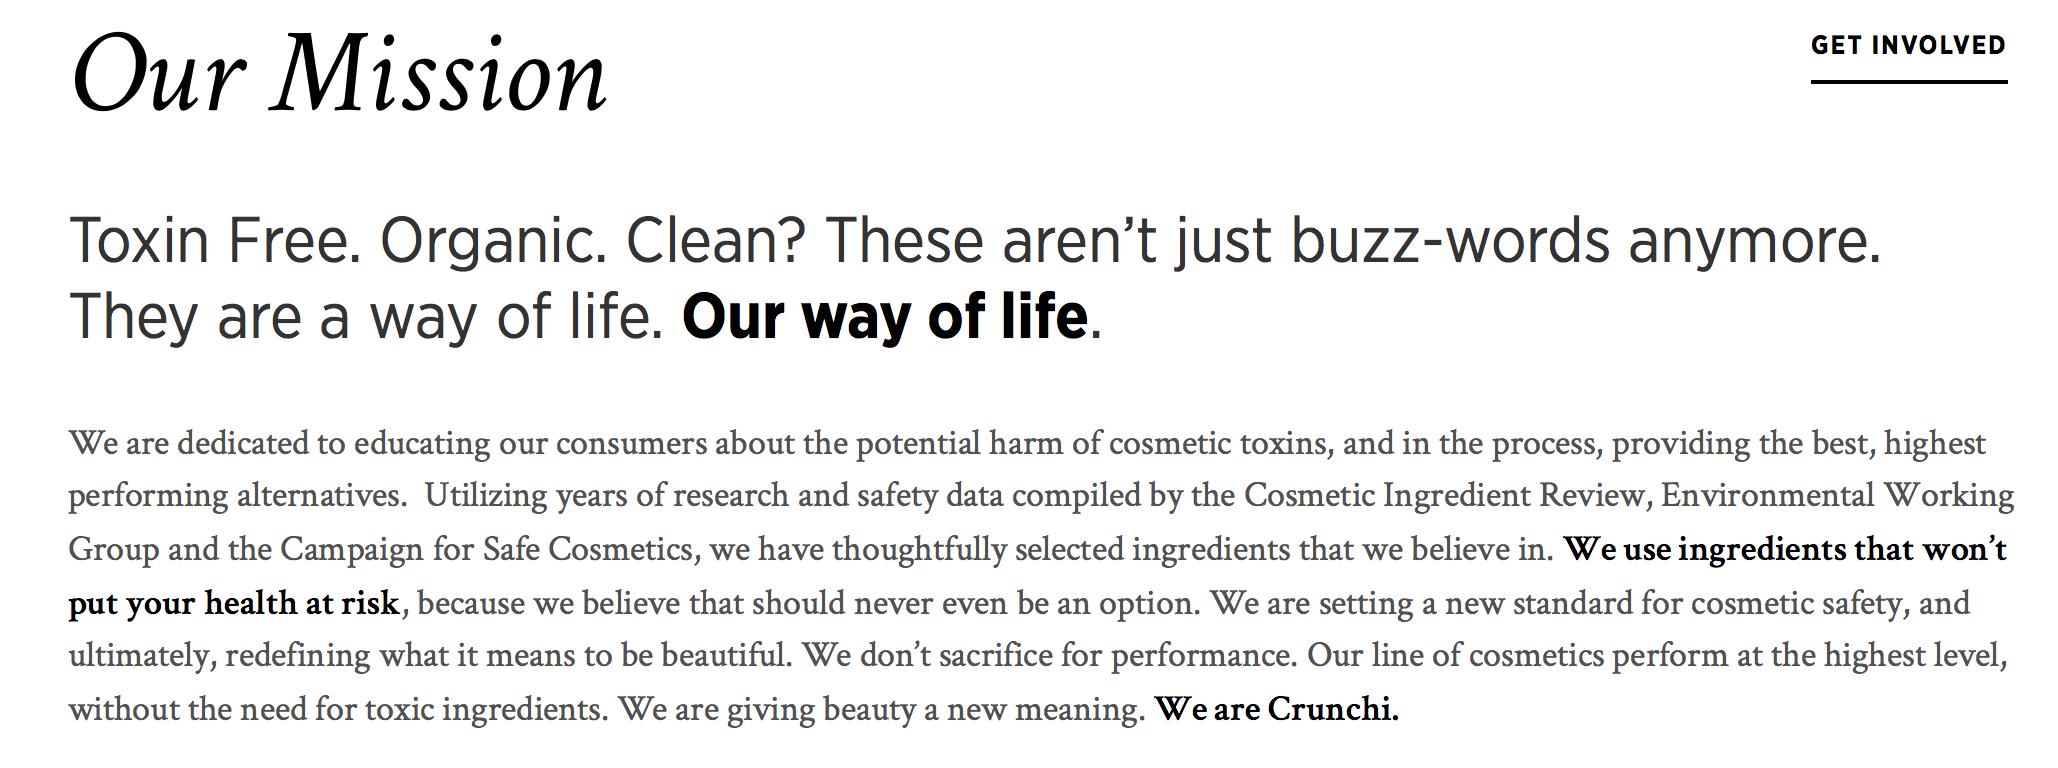 crunchi.com/jenniferrobins